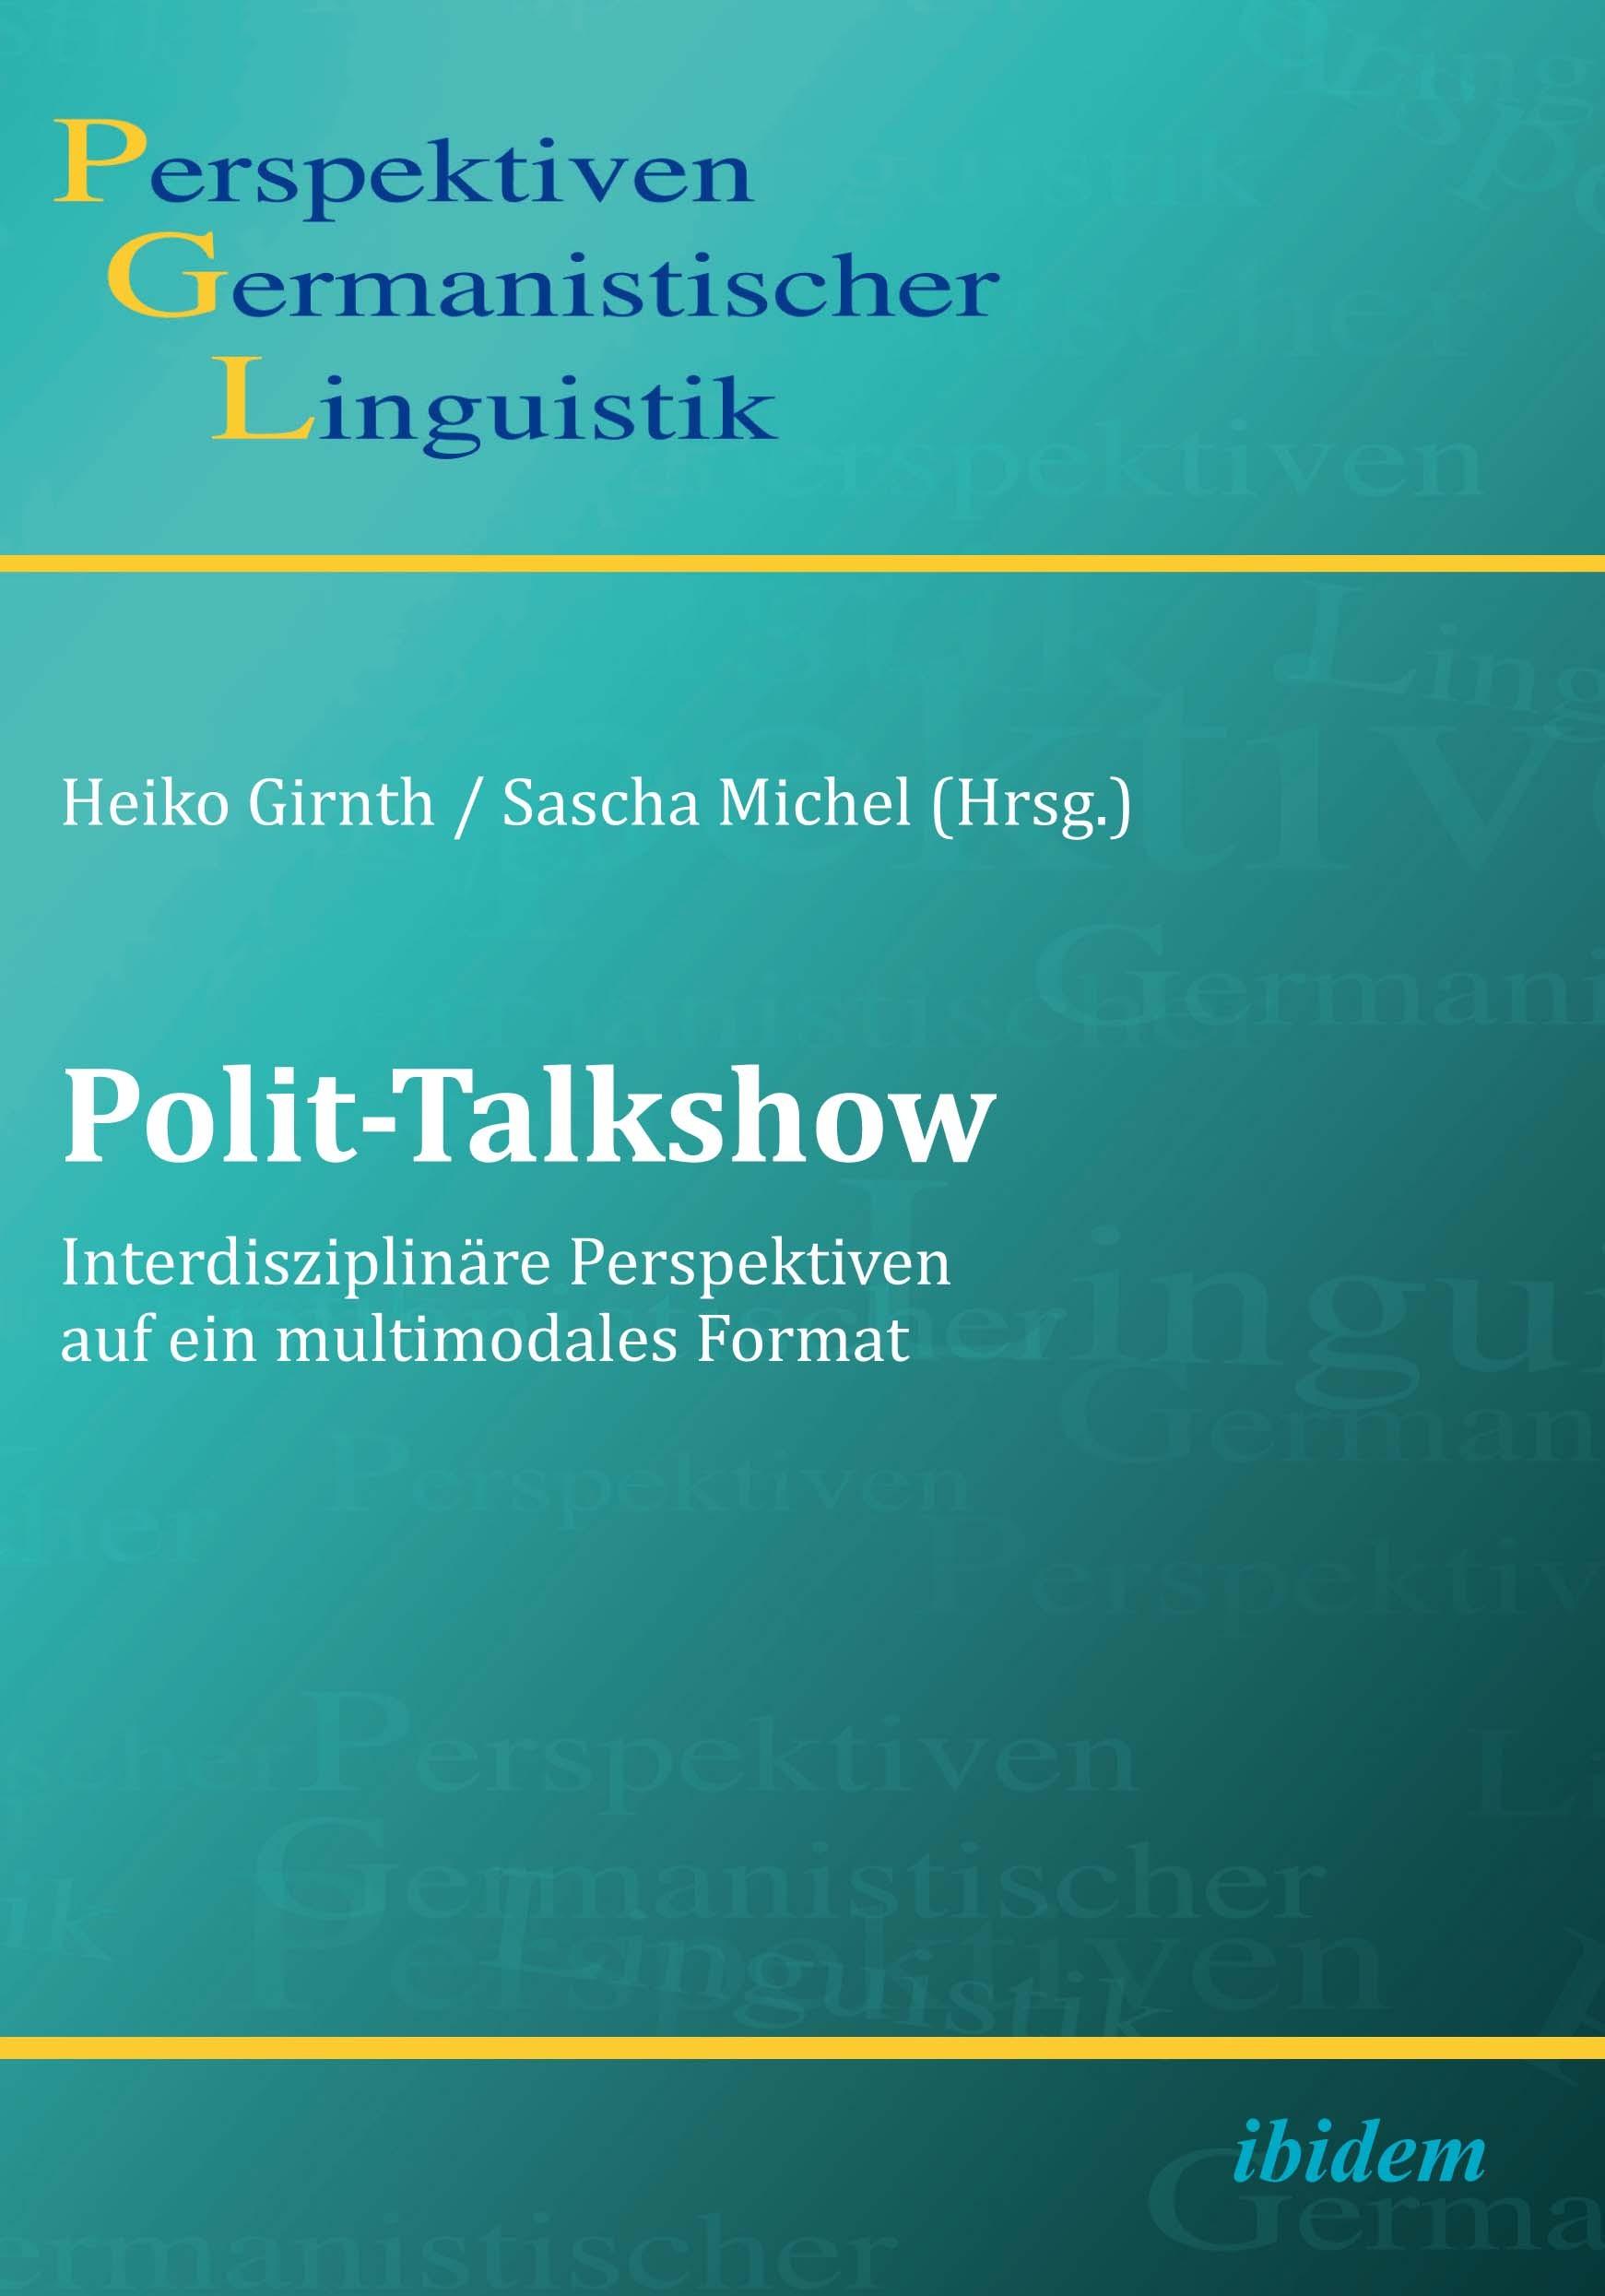 Polit Talkshow